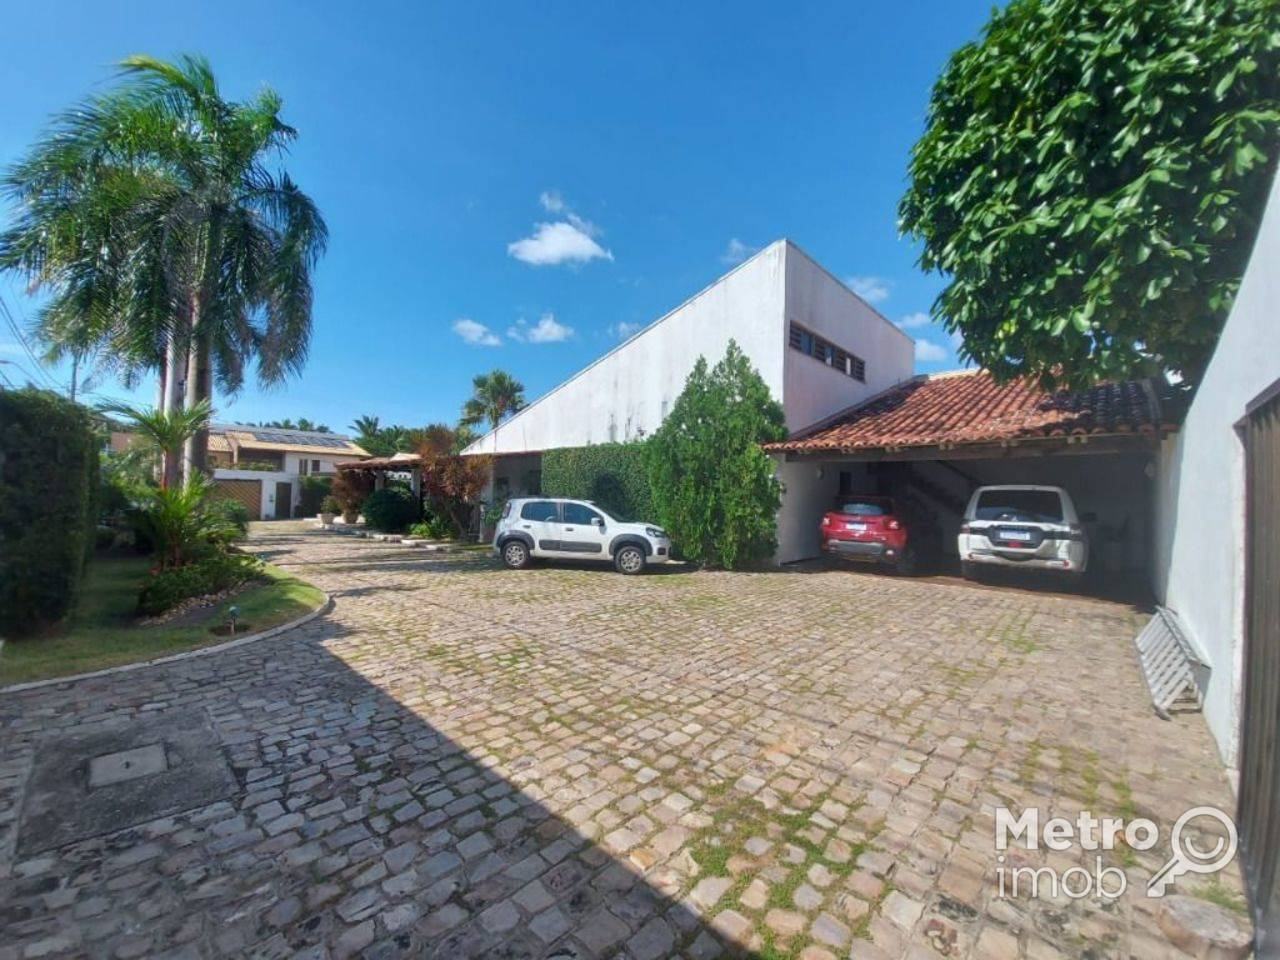 https://static.arboimoveis.com.br/VL0023_METRO/village-a-venda-calhau-sao-luis1630430235826xbvli.jpg